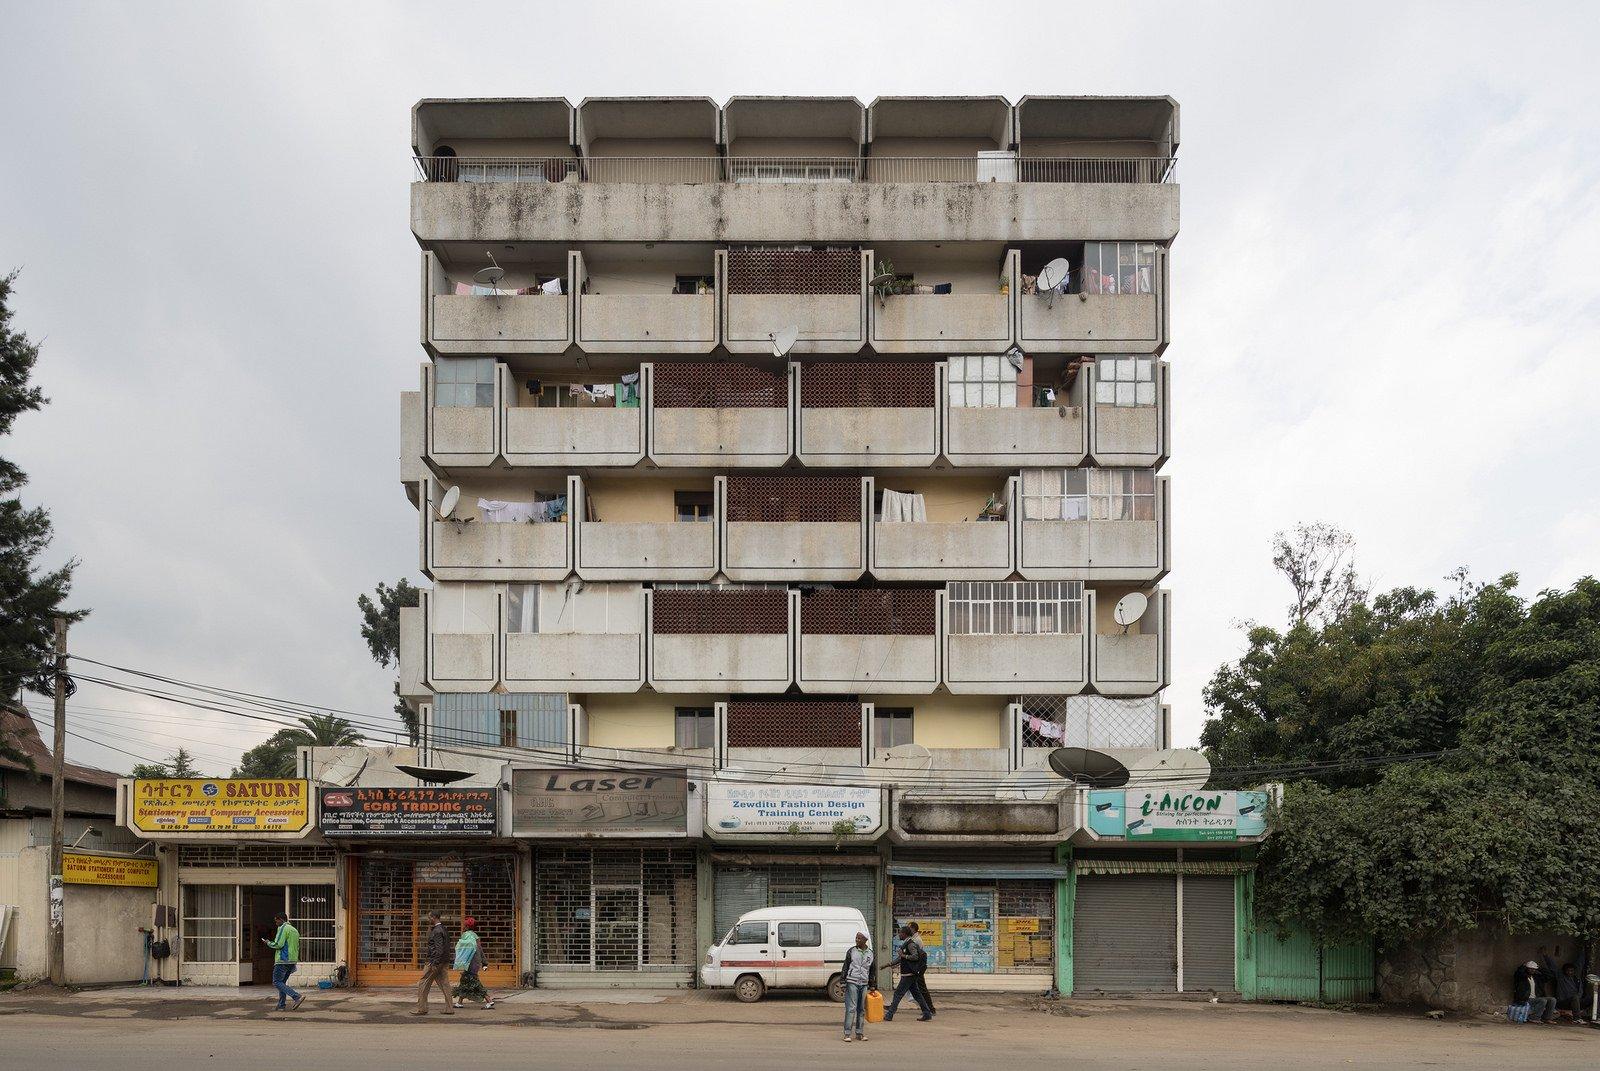 David Schalliol On Twitter Ethiopian Modernism In Addis Ababa Https T Co Nhxo3lkhfa